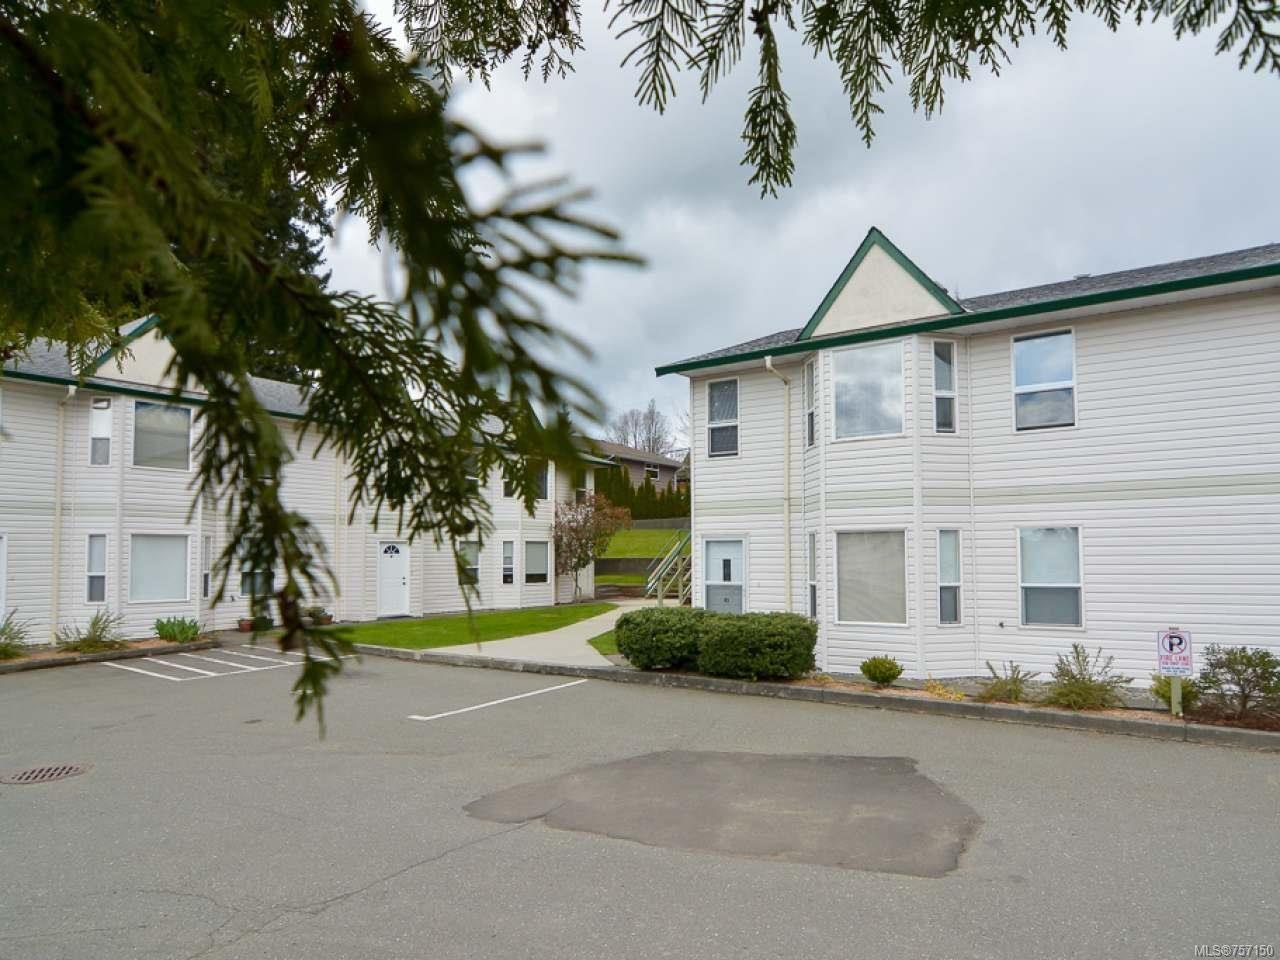 Main Photo: 48 1535 DINGWALL ROAD in COURTENAY: CV Courtenay East Condo for sale (Comox Valley)  : MLS®# 757150